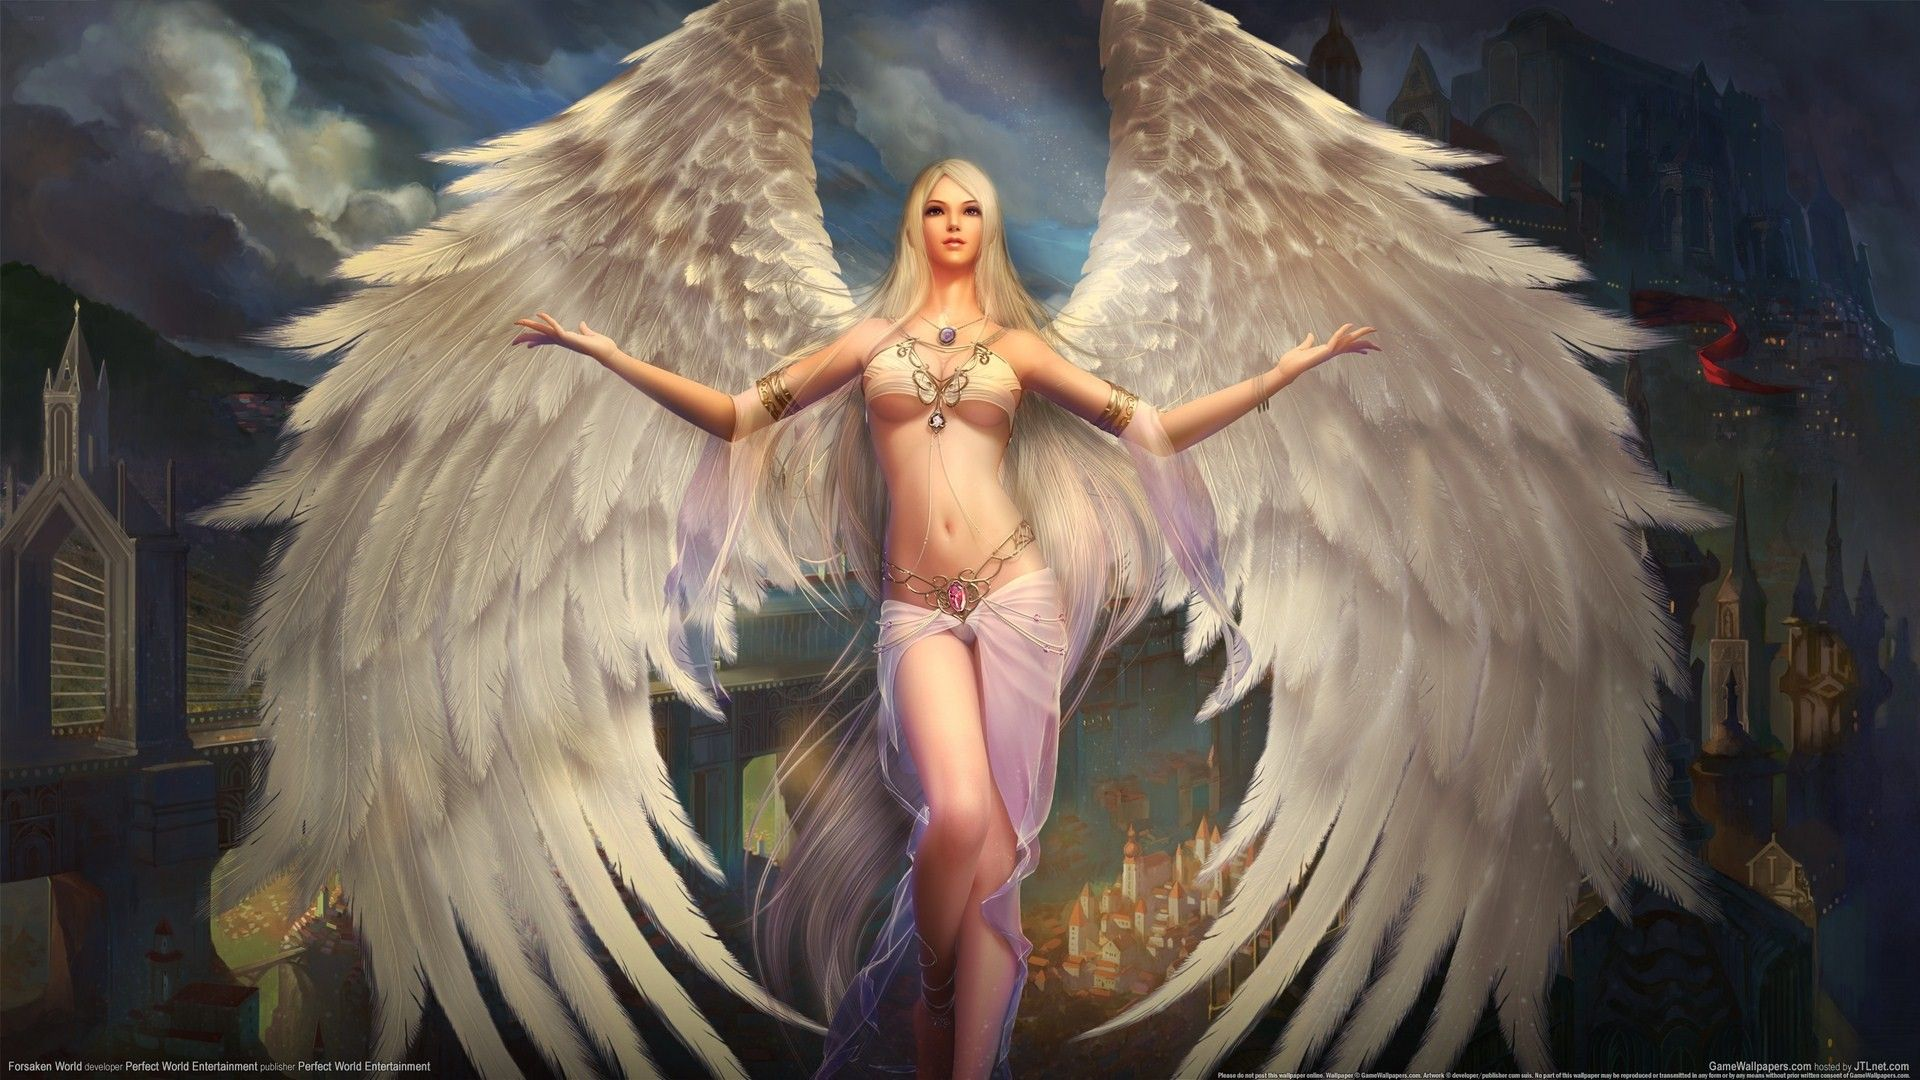 Erotic angel wallpaper